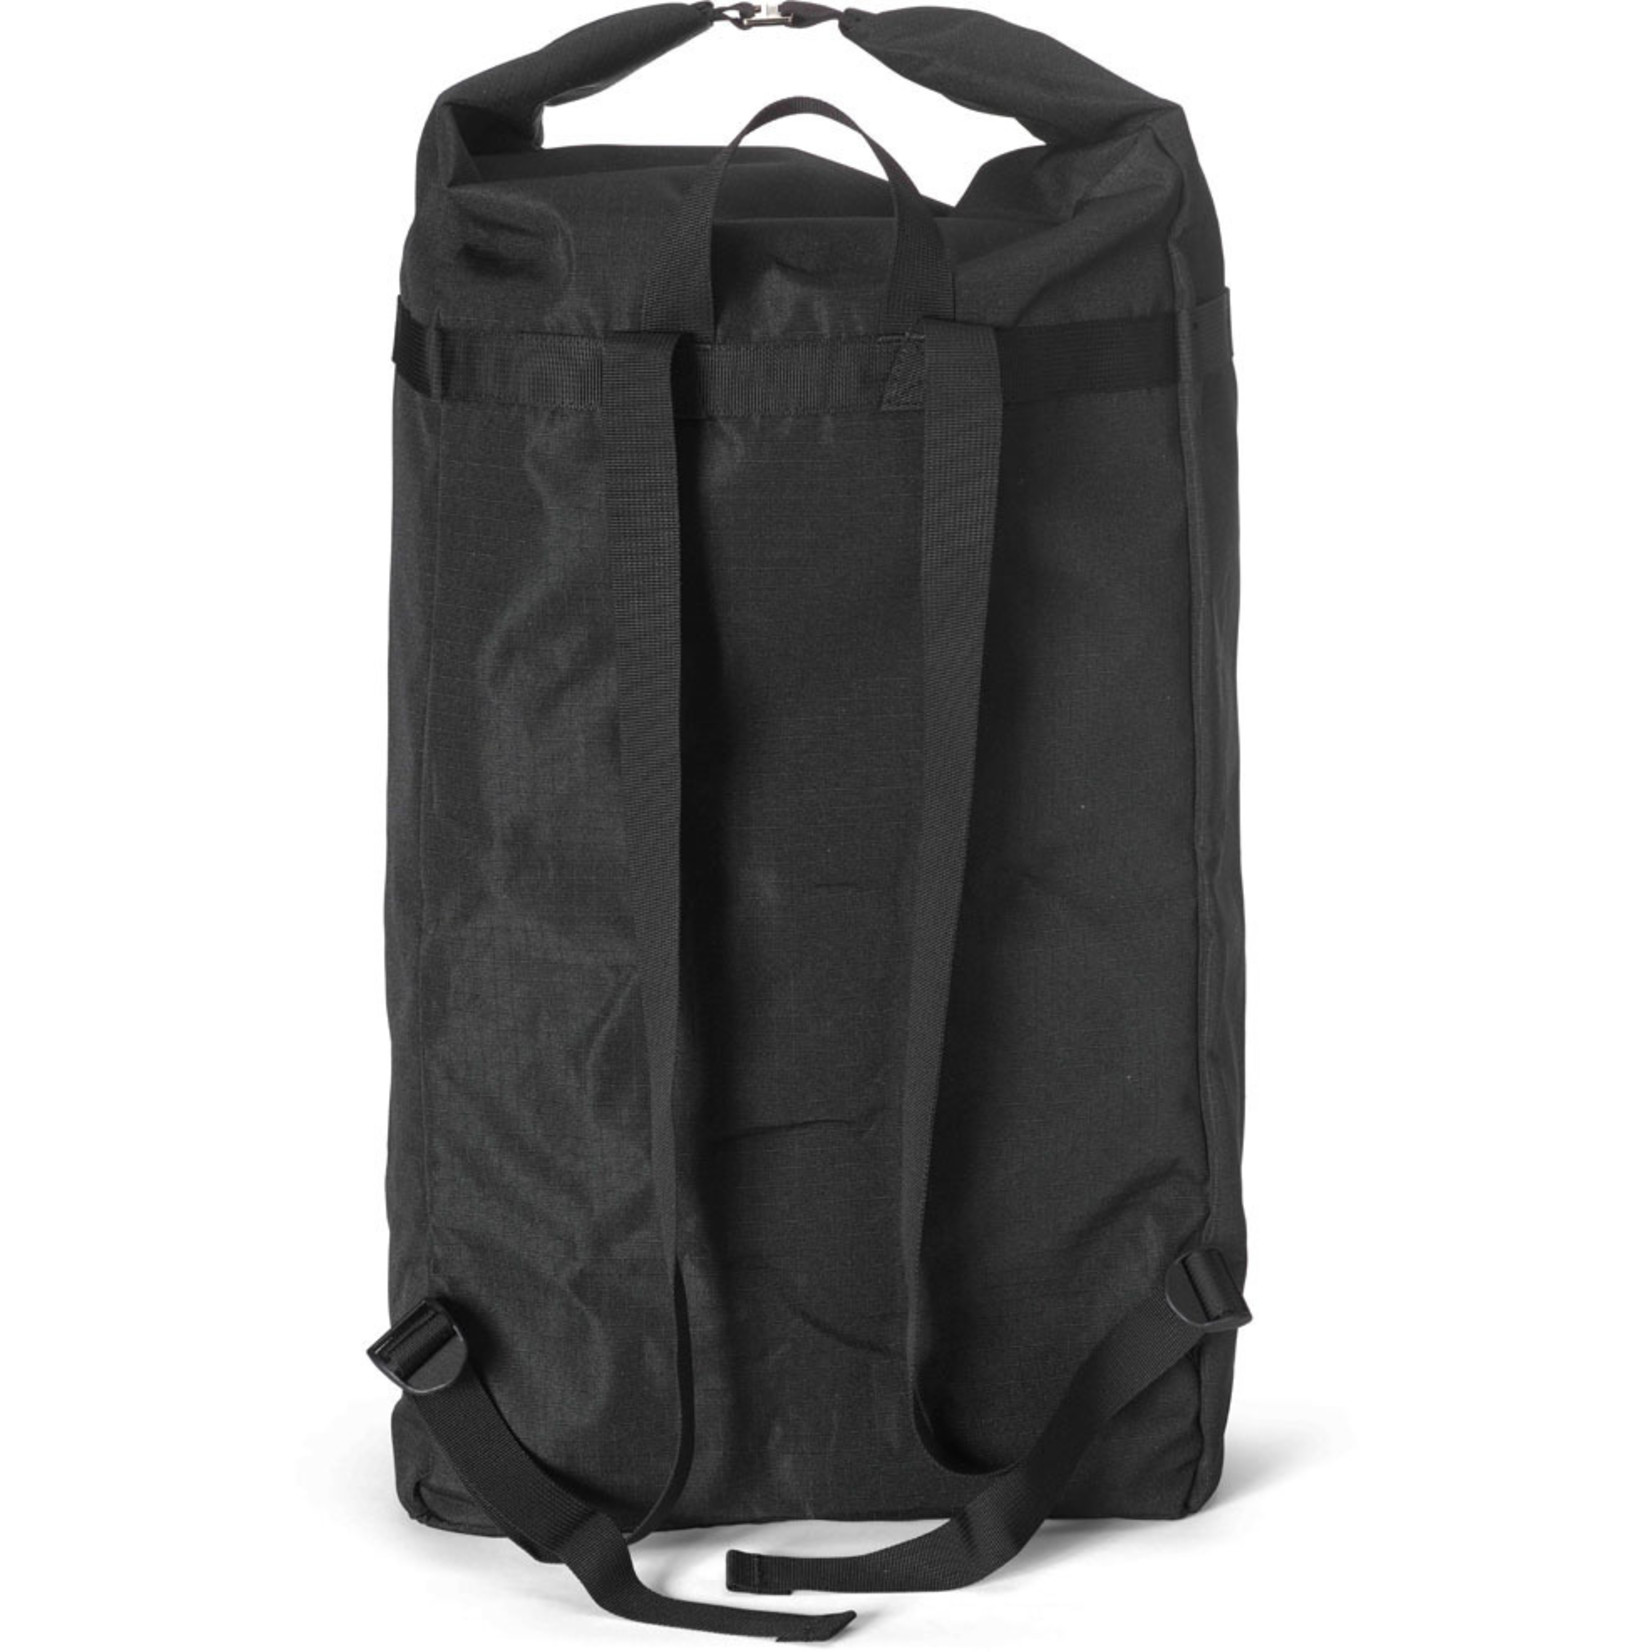 Primus Primus Kuchoma grill tas, ontworpen als rugzak